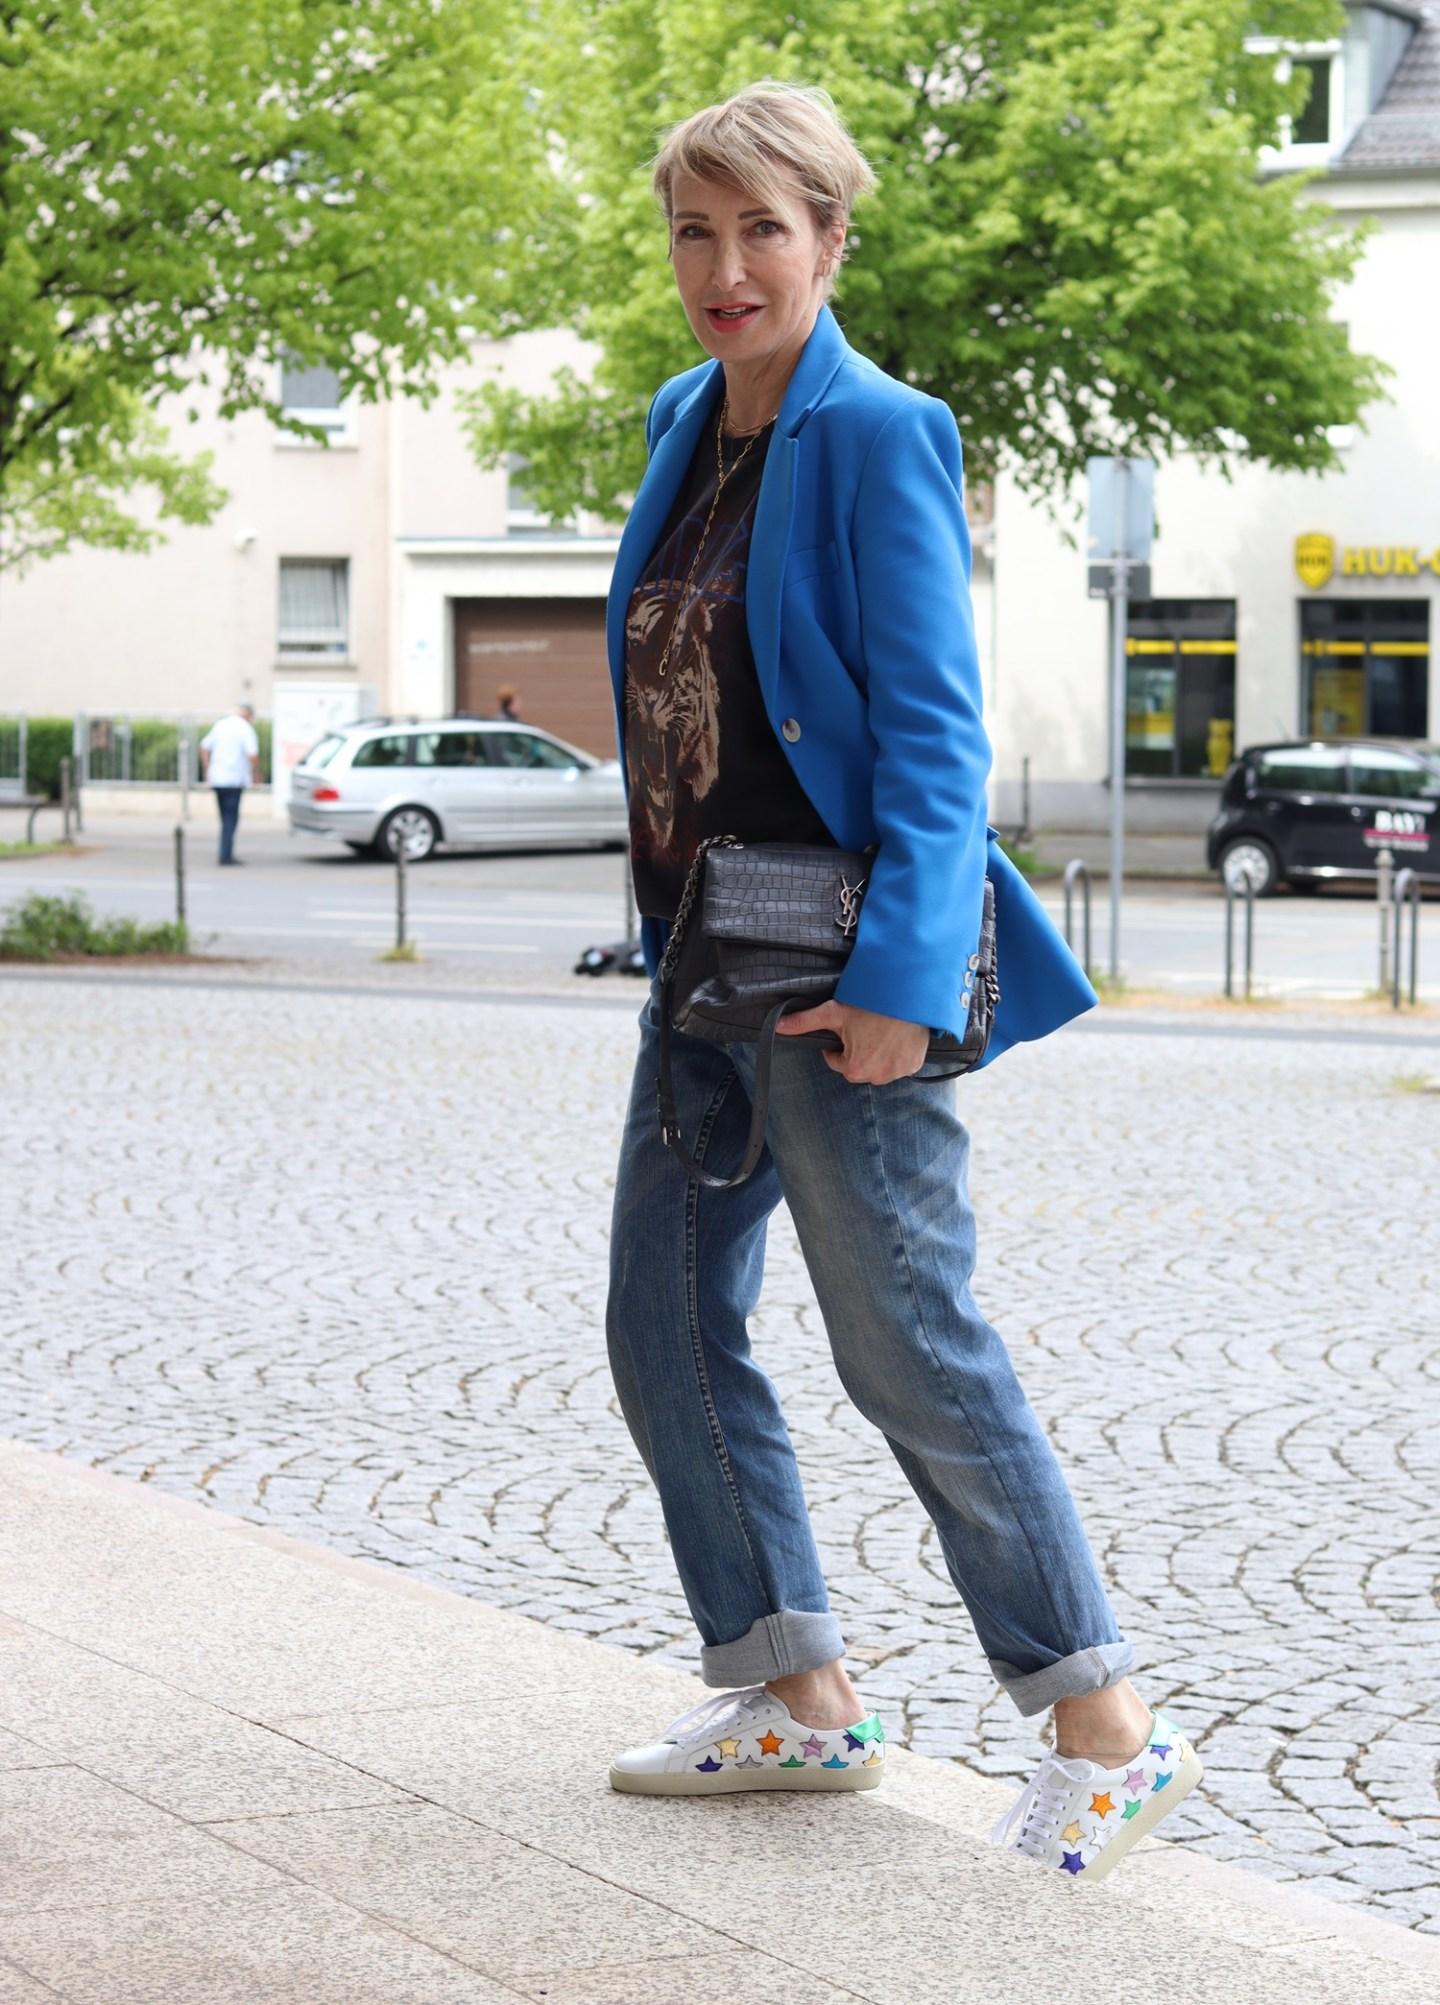 Glamupyourlifestyle modefluesterin alte Jeanshose neu kombinieren ue-40-mode ue-50-blog